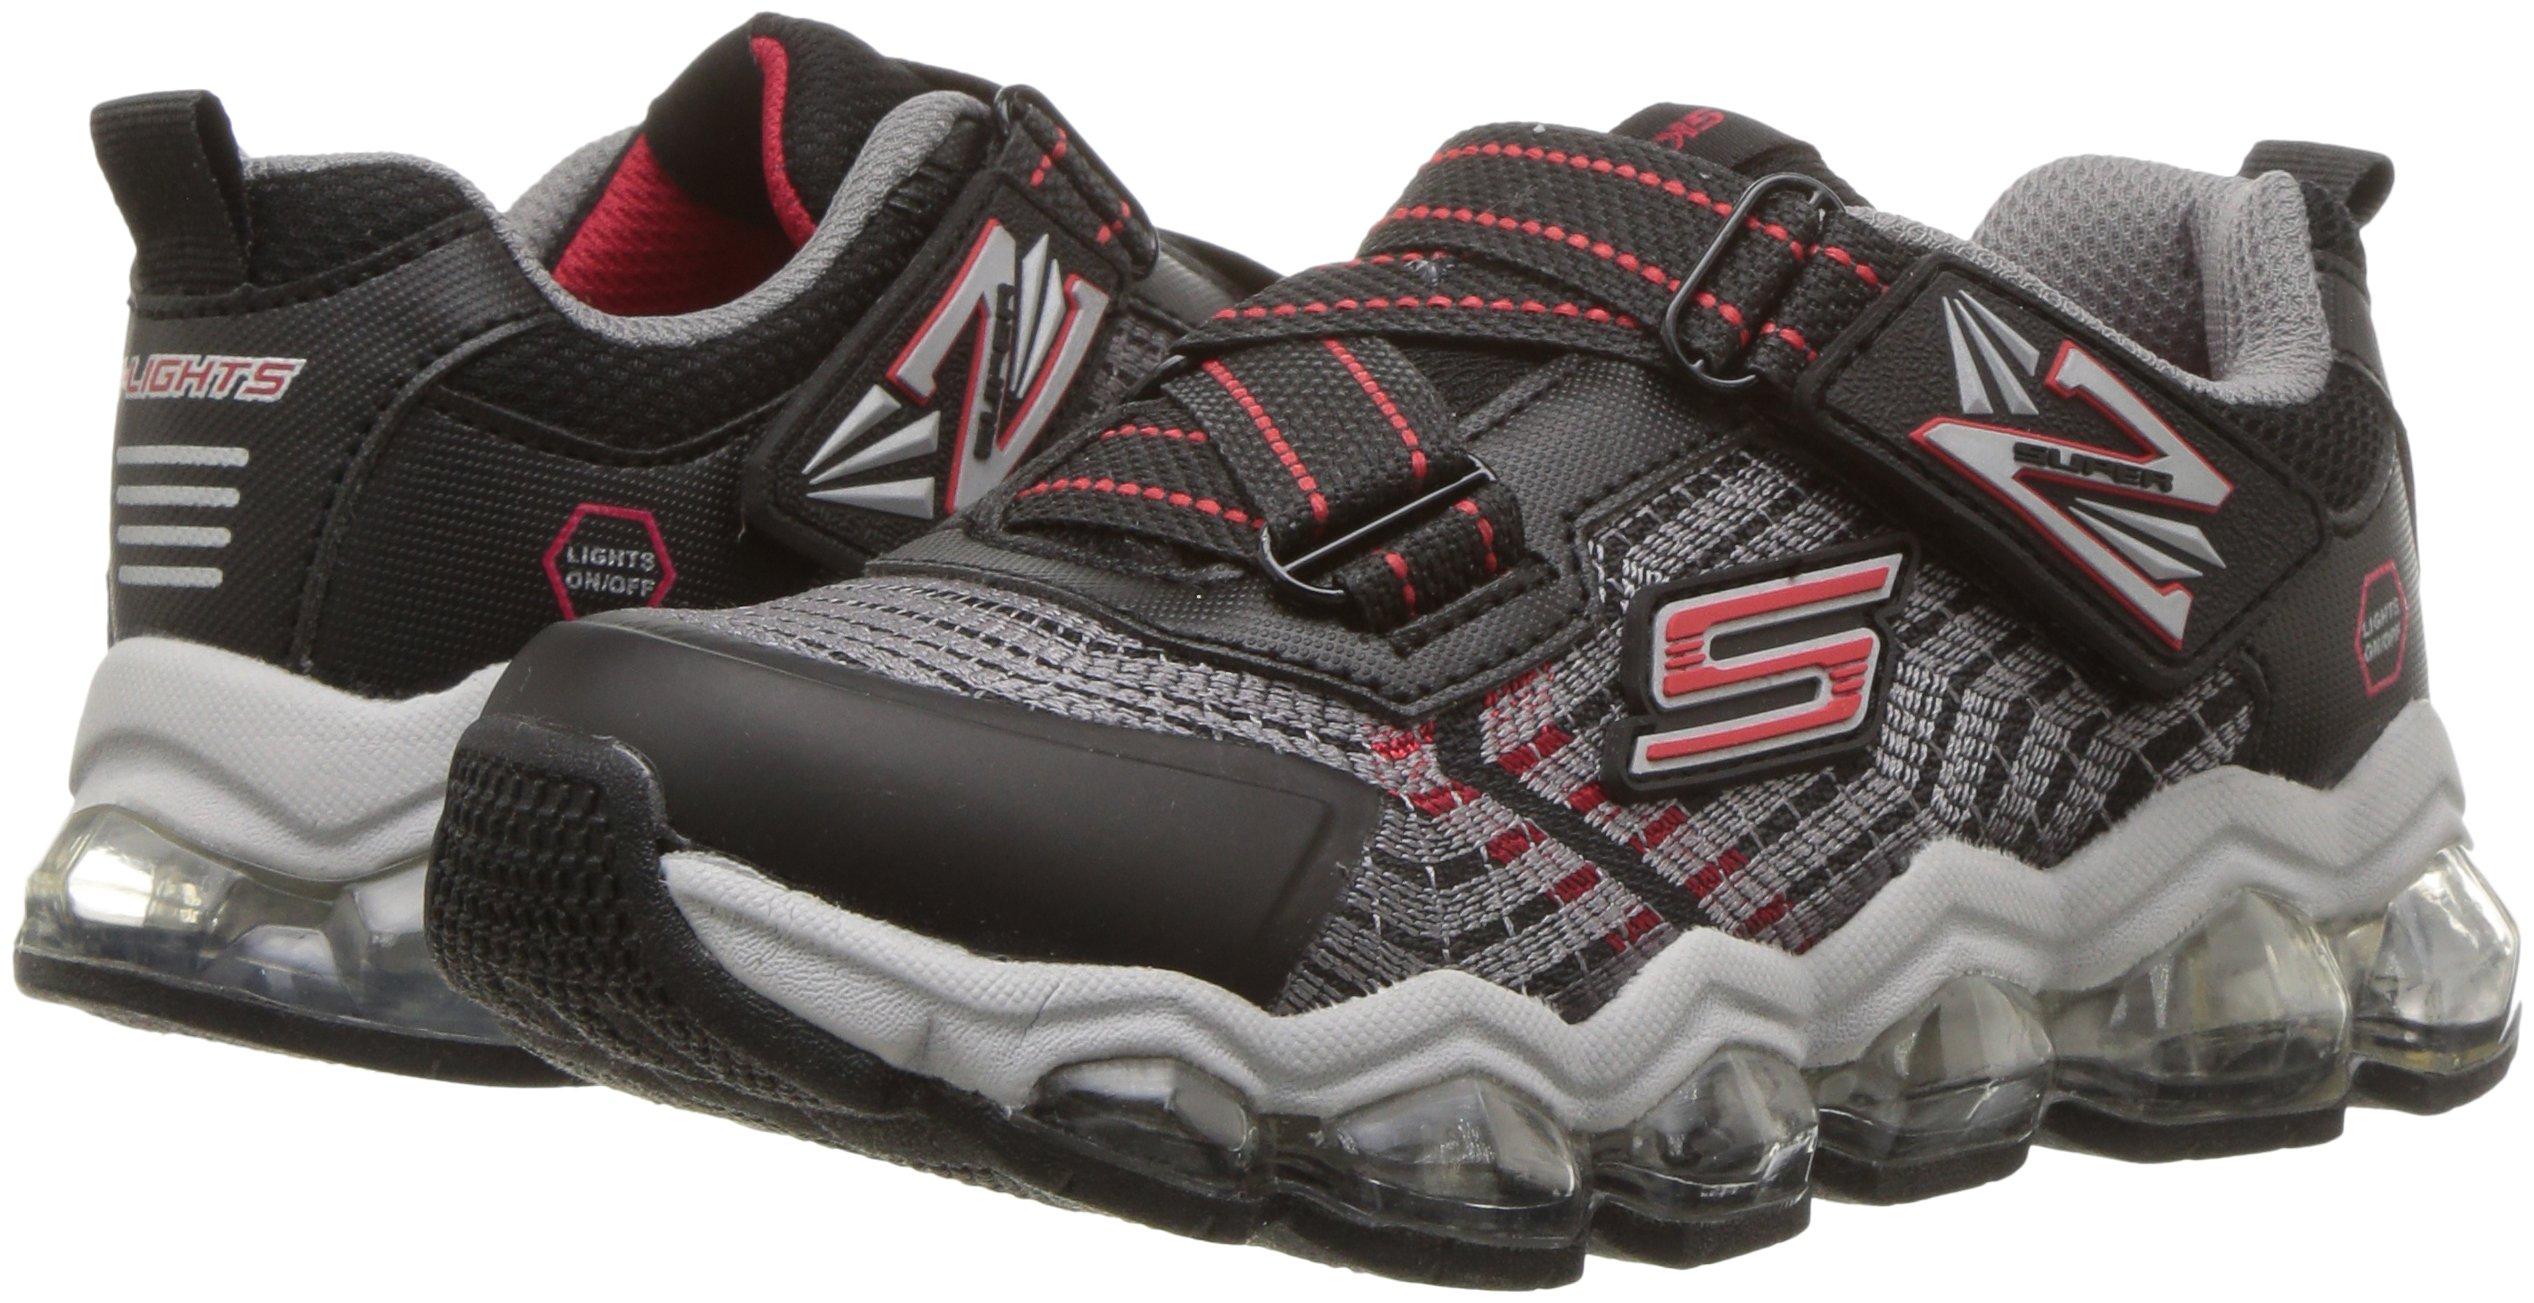 Skechers Kids Boys' Turbo-Flash-90596L Sneaker,Black/red,3 Medium US Little Kid by Skechers (Image #5)